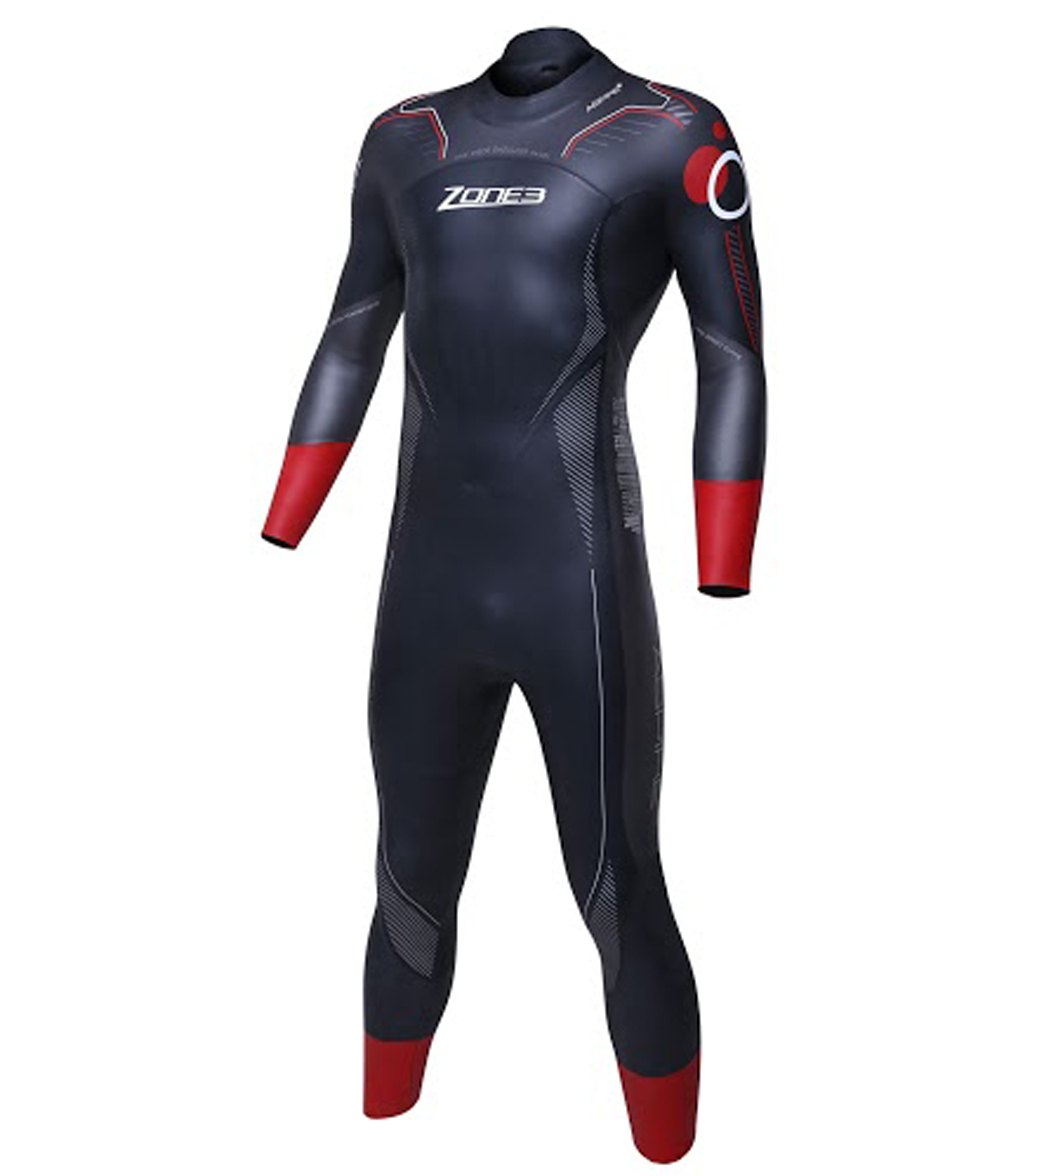 Zone 3 Aspire Open Water Swimming Wetsuit